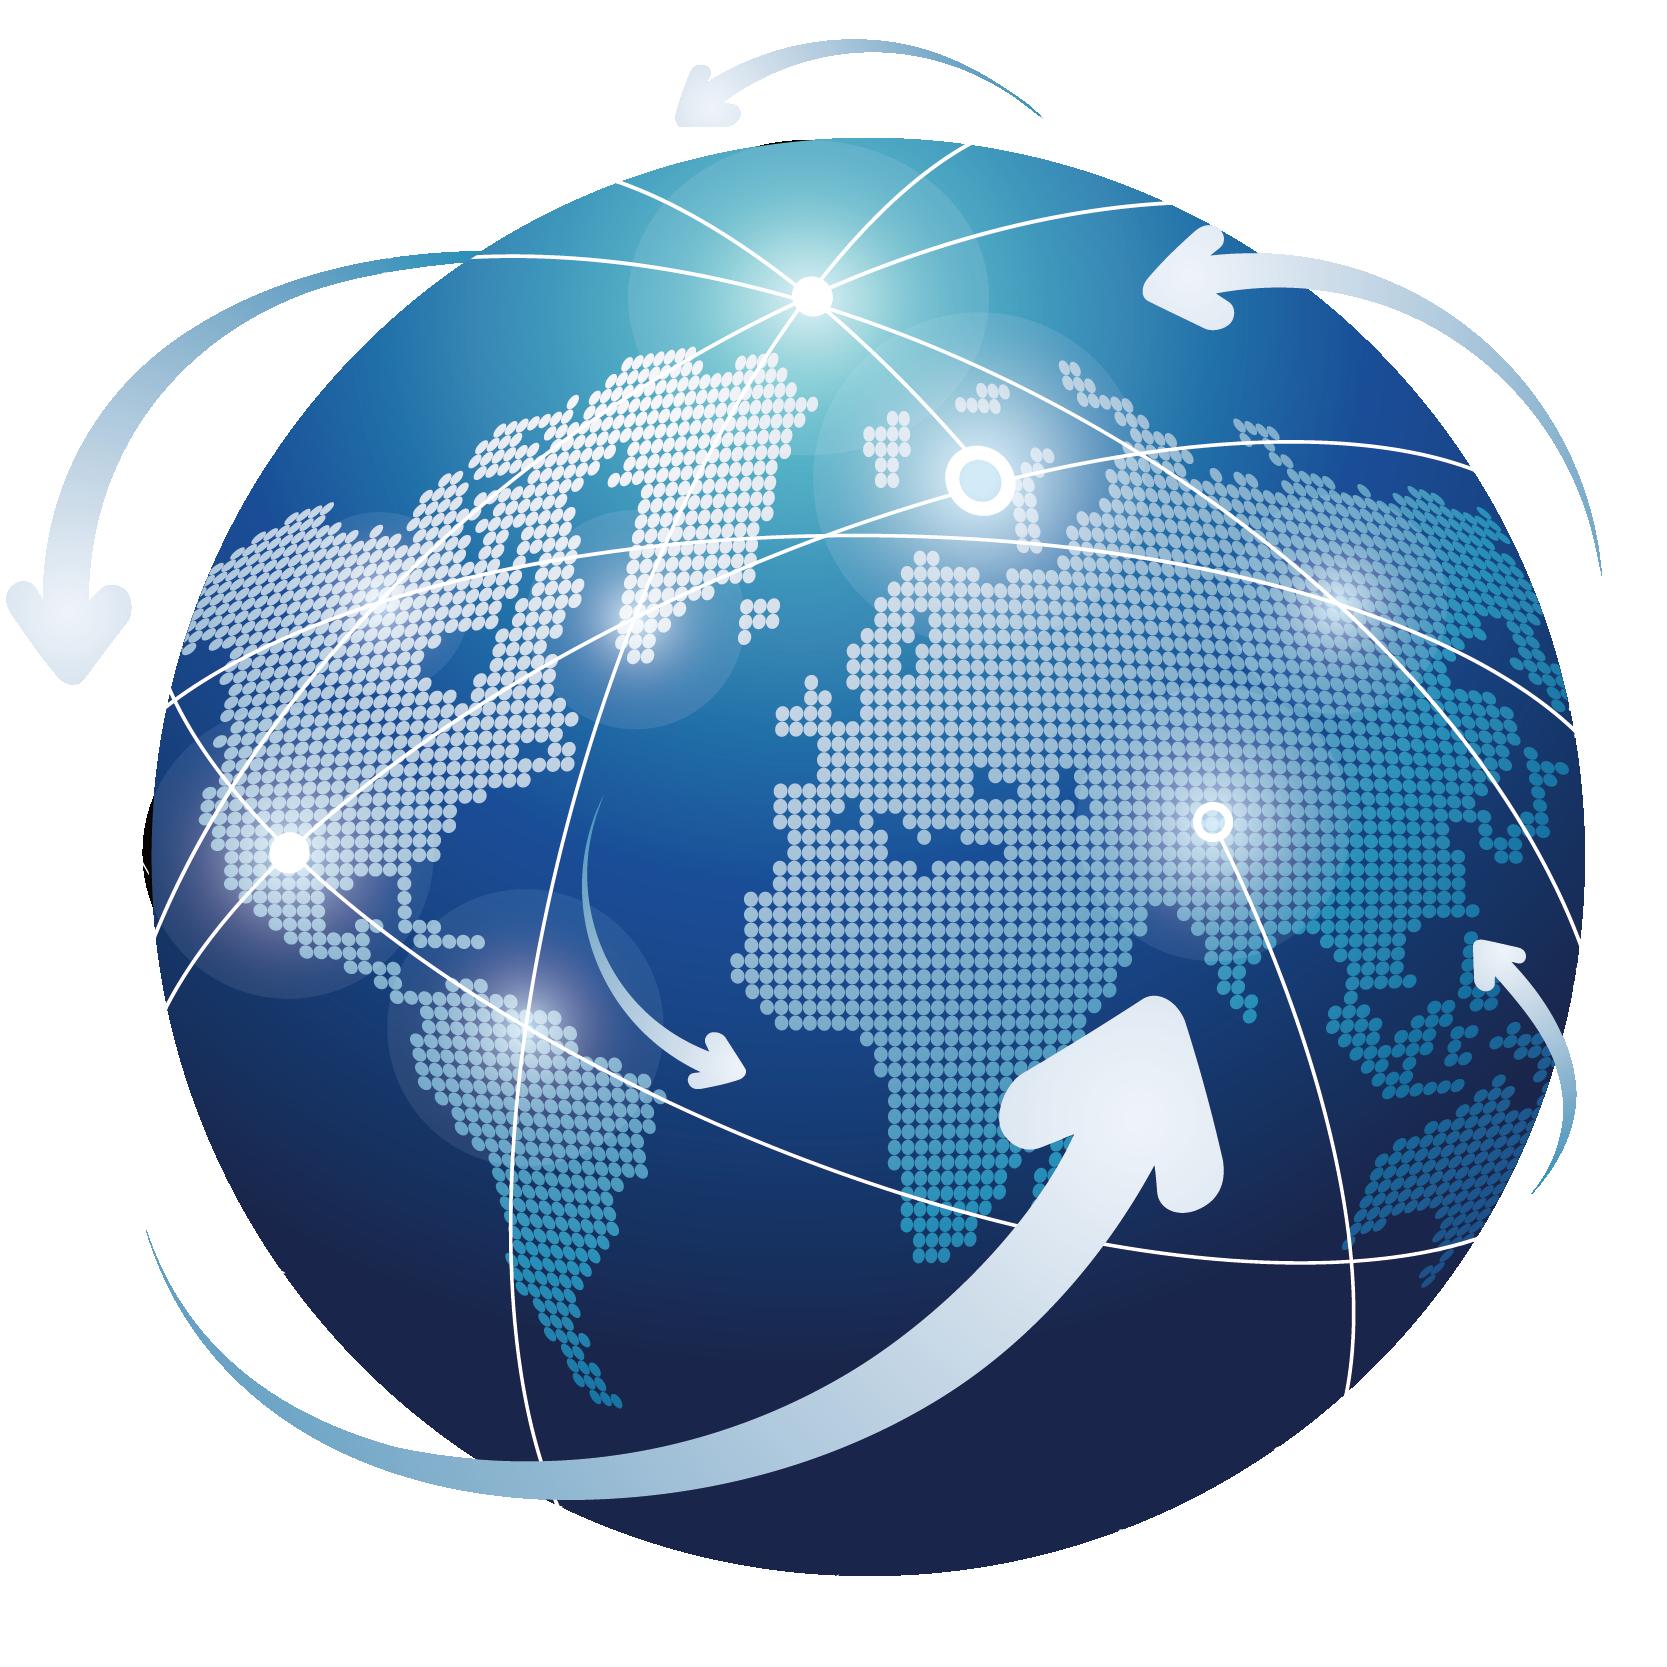 Planet clipart orbit planet. Globe logo clip art